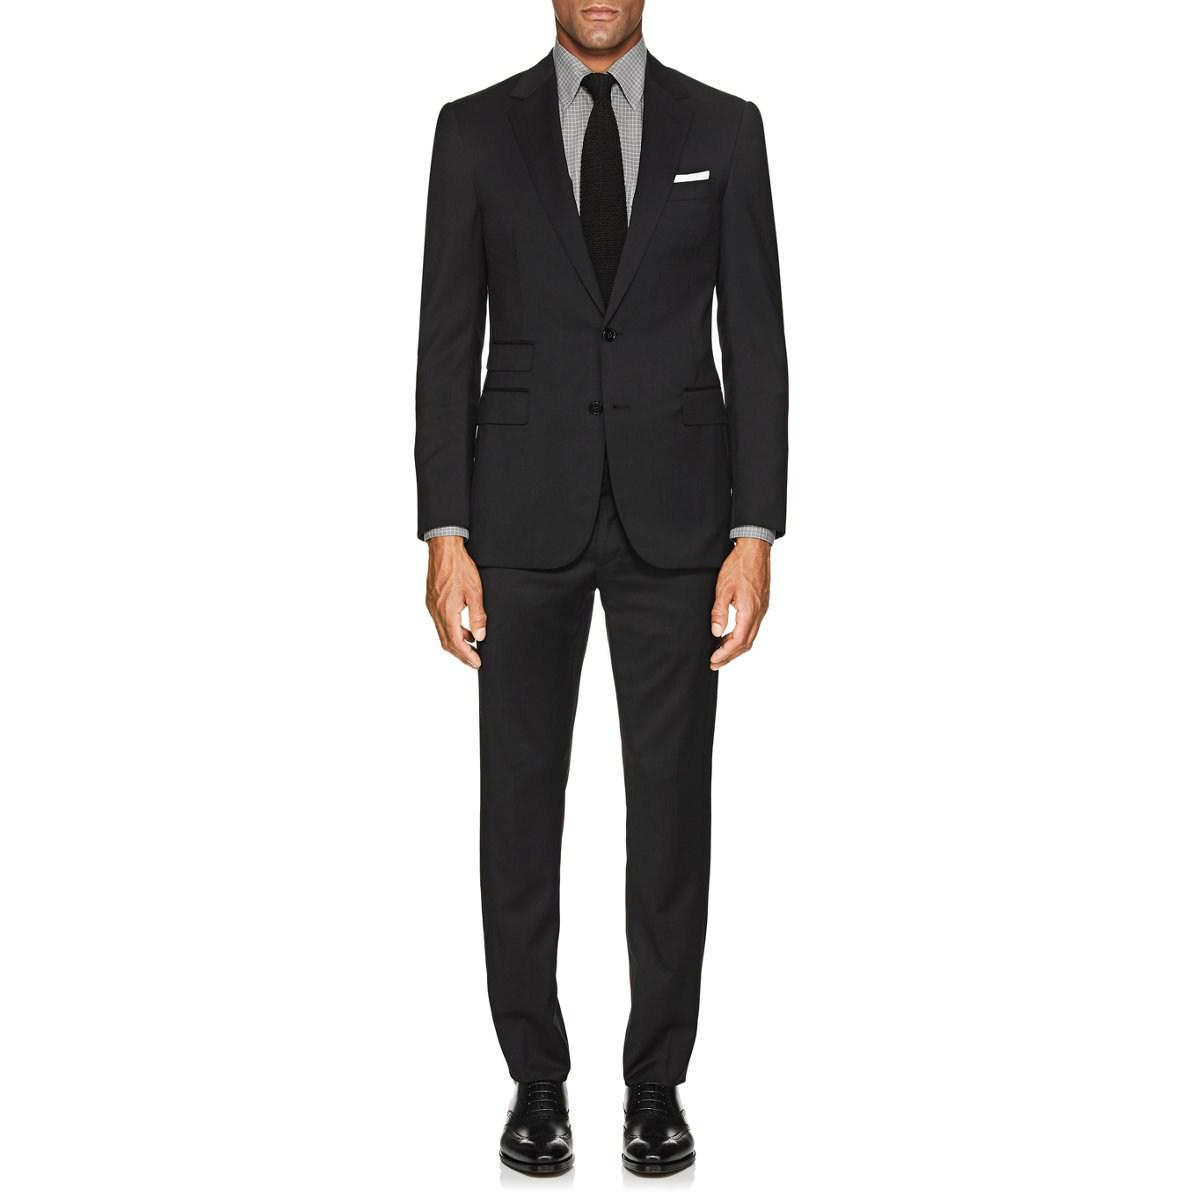 2914c86cf51a Ralph Lauren Purple Label Douglas Wool Two-button Suit in Black for ...